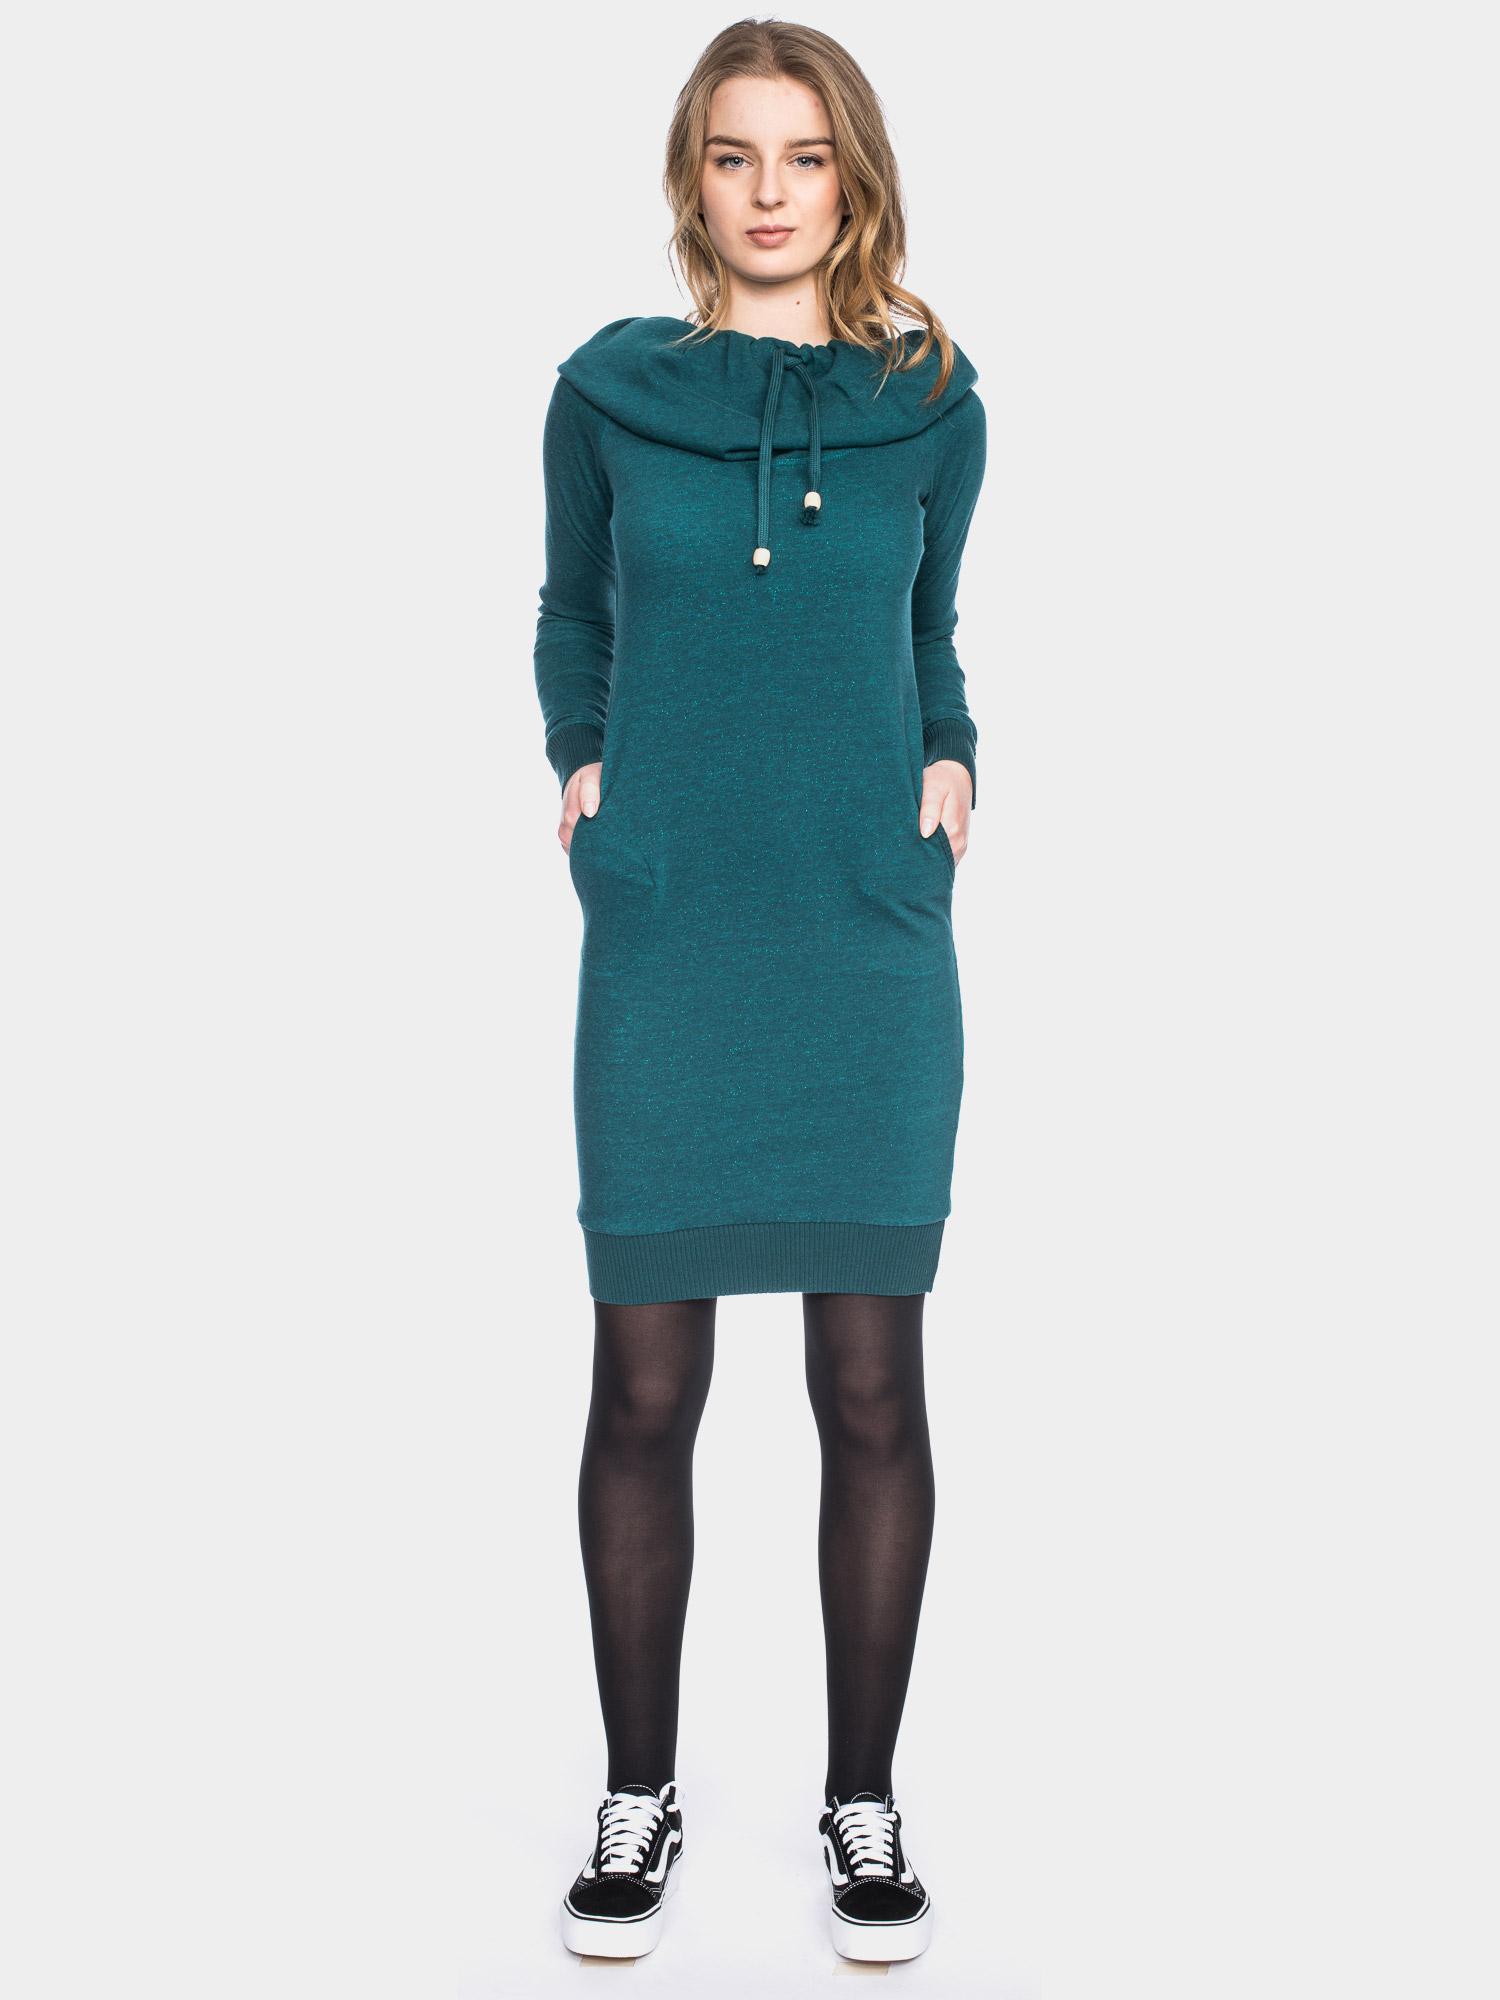 Langarm Kleid mit großer Kapuze